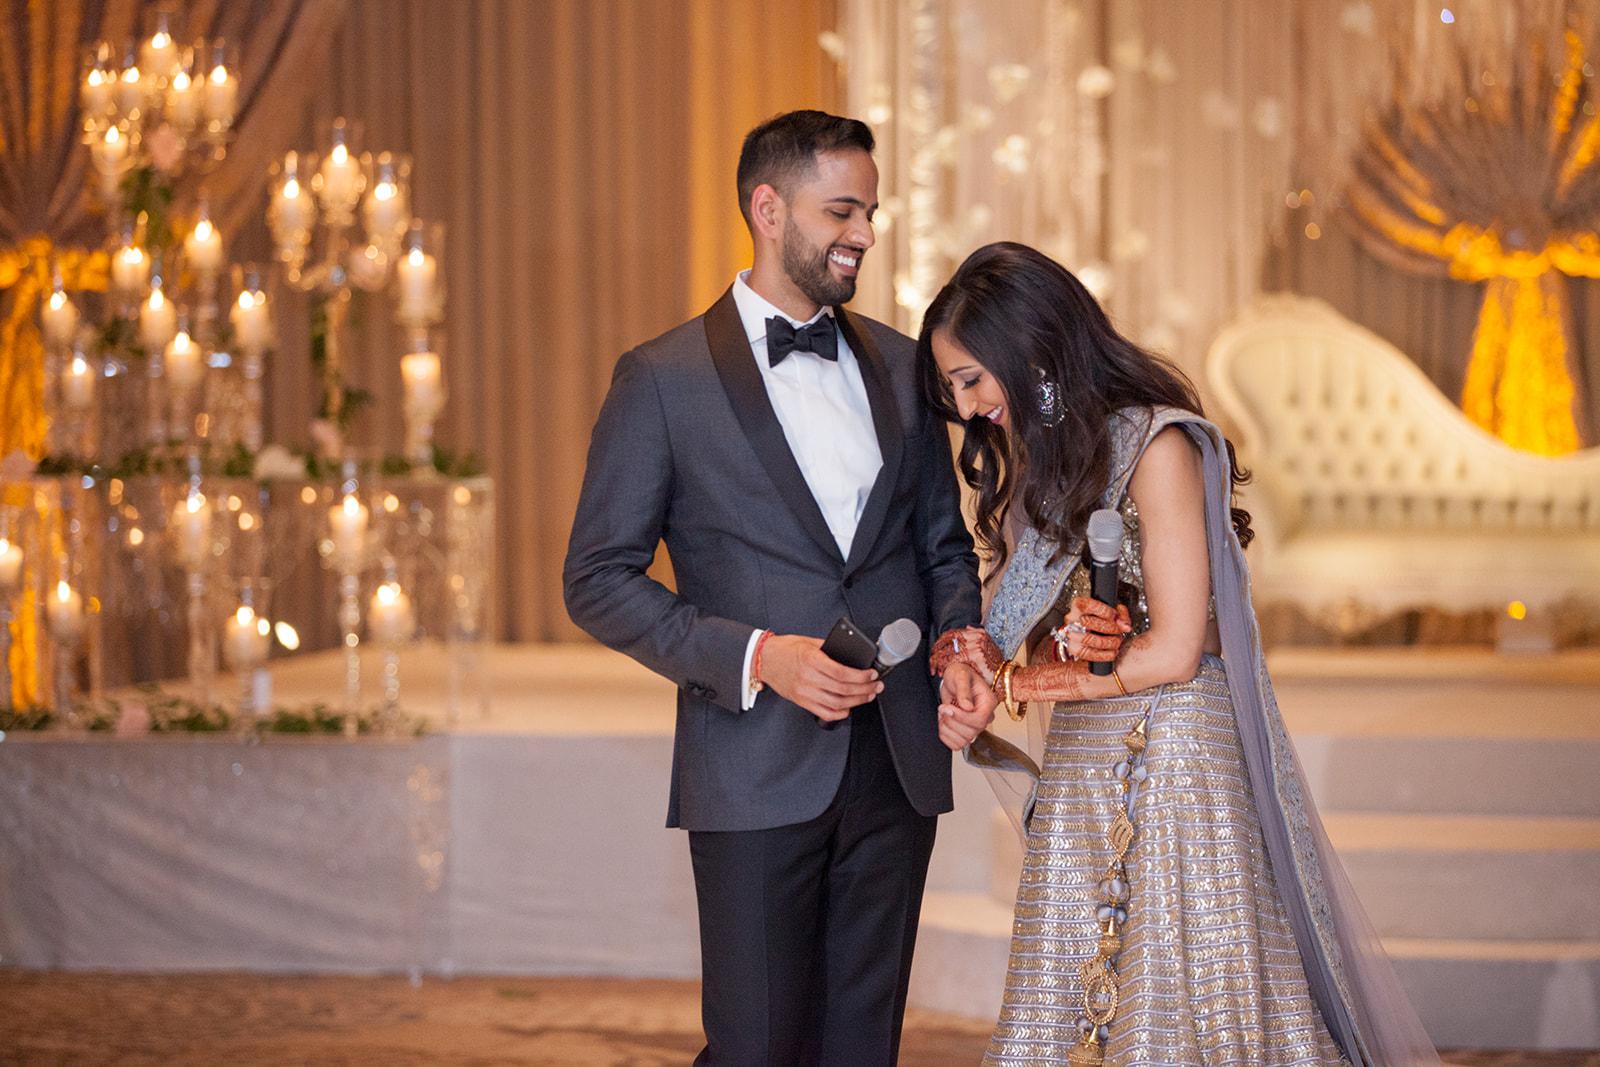 Le Cape Weddings - Puja and Kheelan - Reception -83.jpg